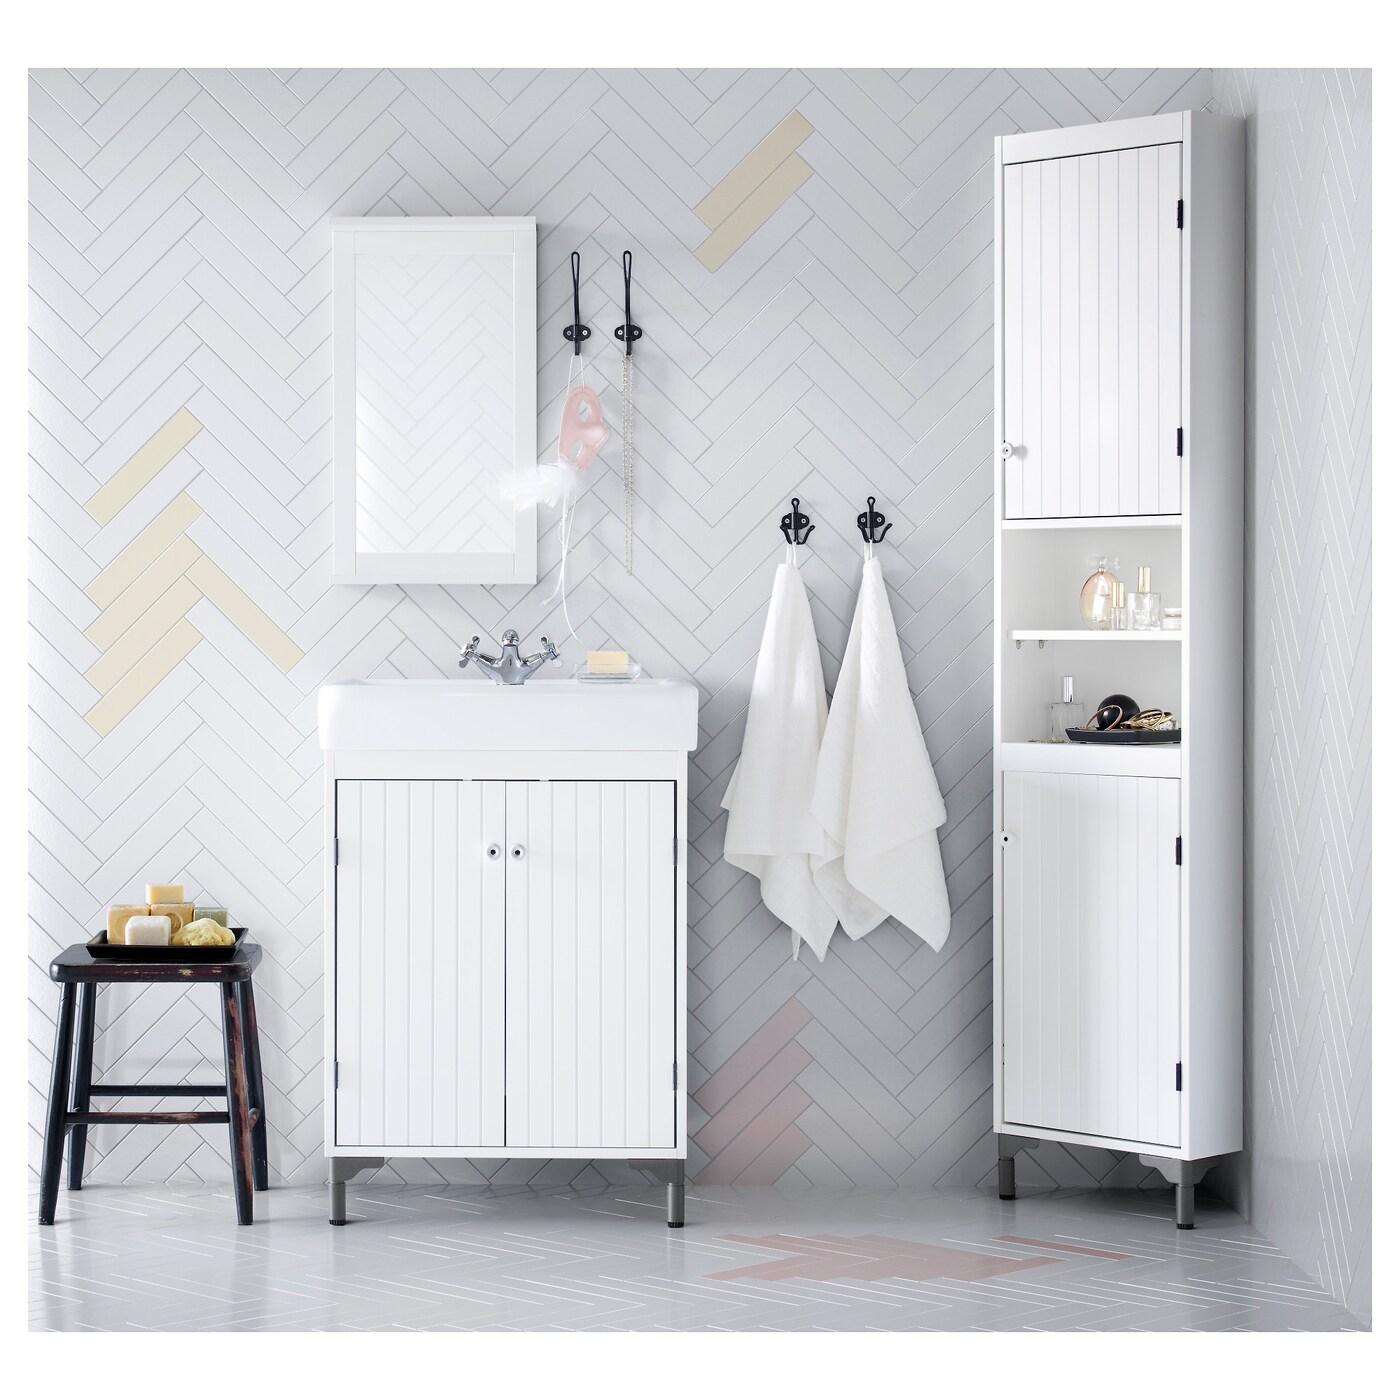 hamnviken single wash basin 60x45x11 cm ikea. Black Bedroom Furniture Sets. Home Design Ideas